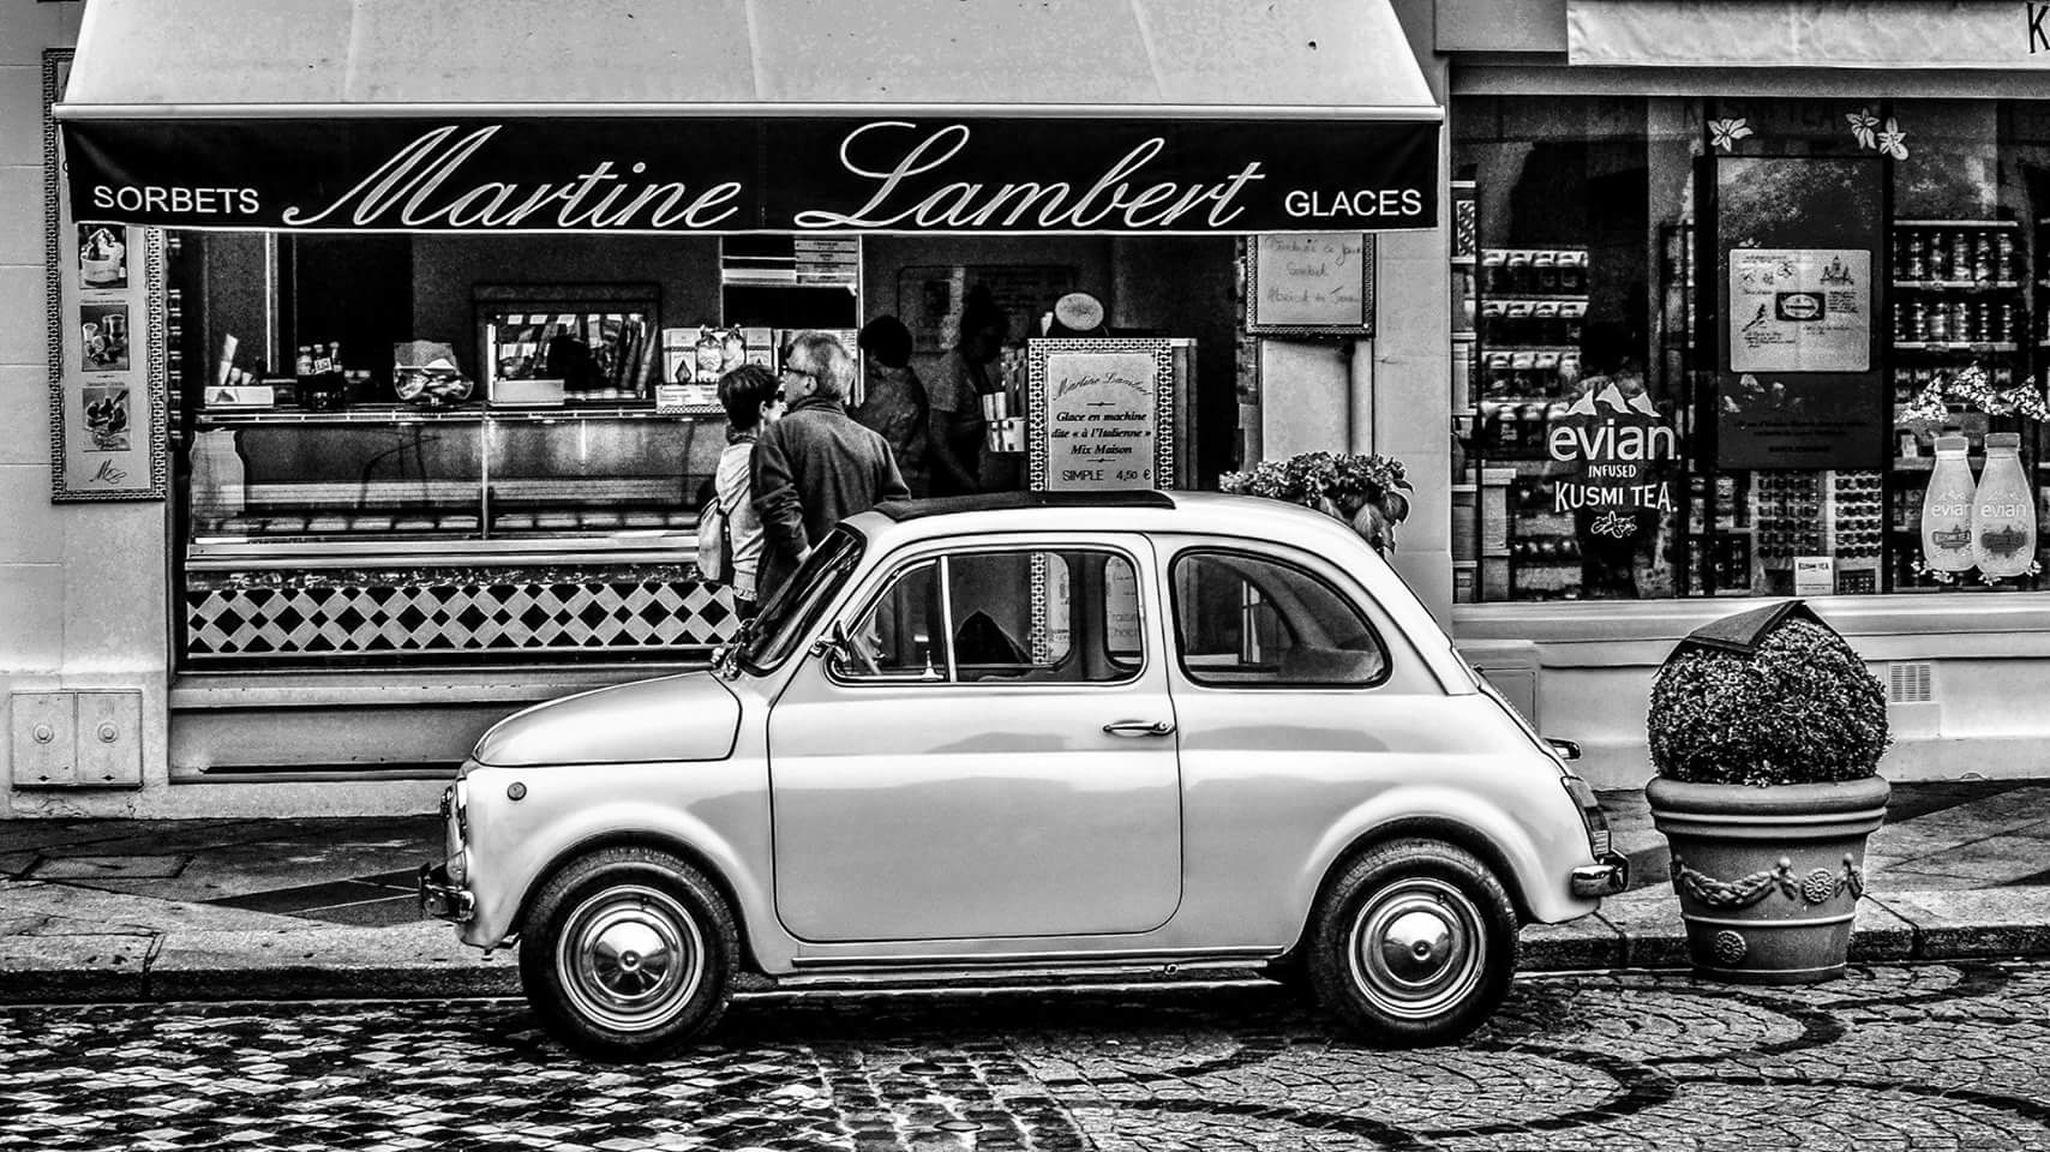 Car Mode Of Transport Retro Styled Outdoors City Devanture Store Voiture Pavement Roues Wheels Old Old Car Noiretblanc Noir&blanc Blackandwhite Black & White